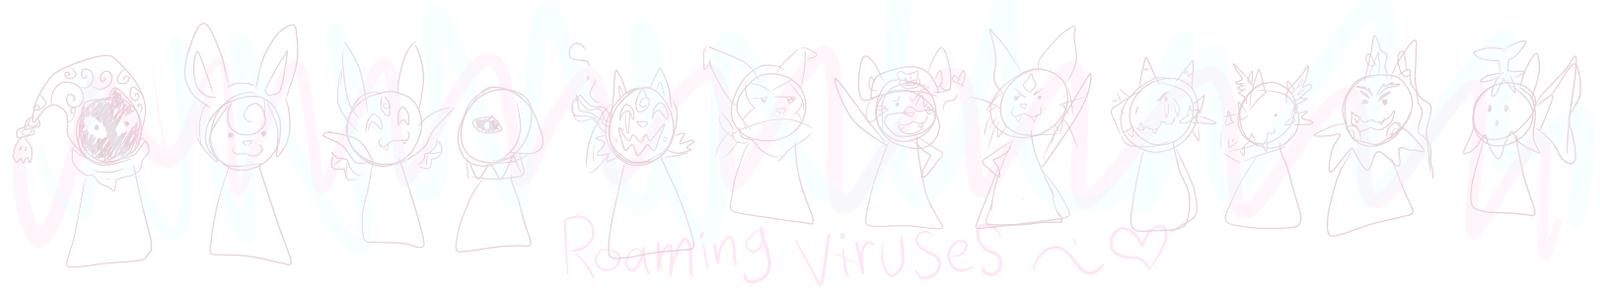 Roaming Viruses guild by Beautyh